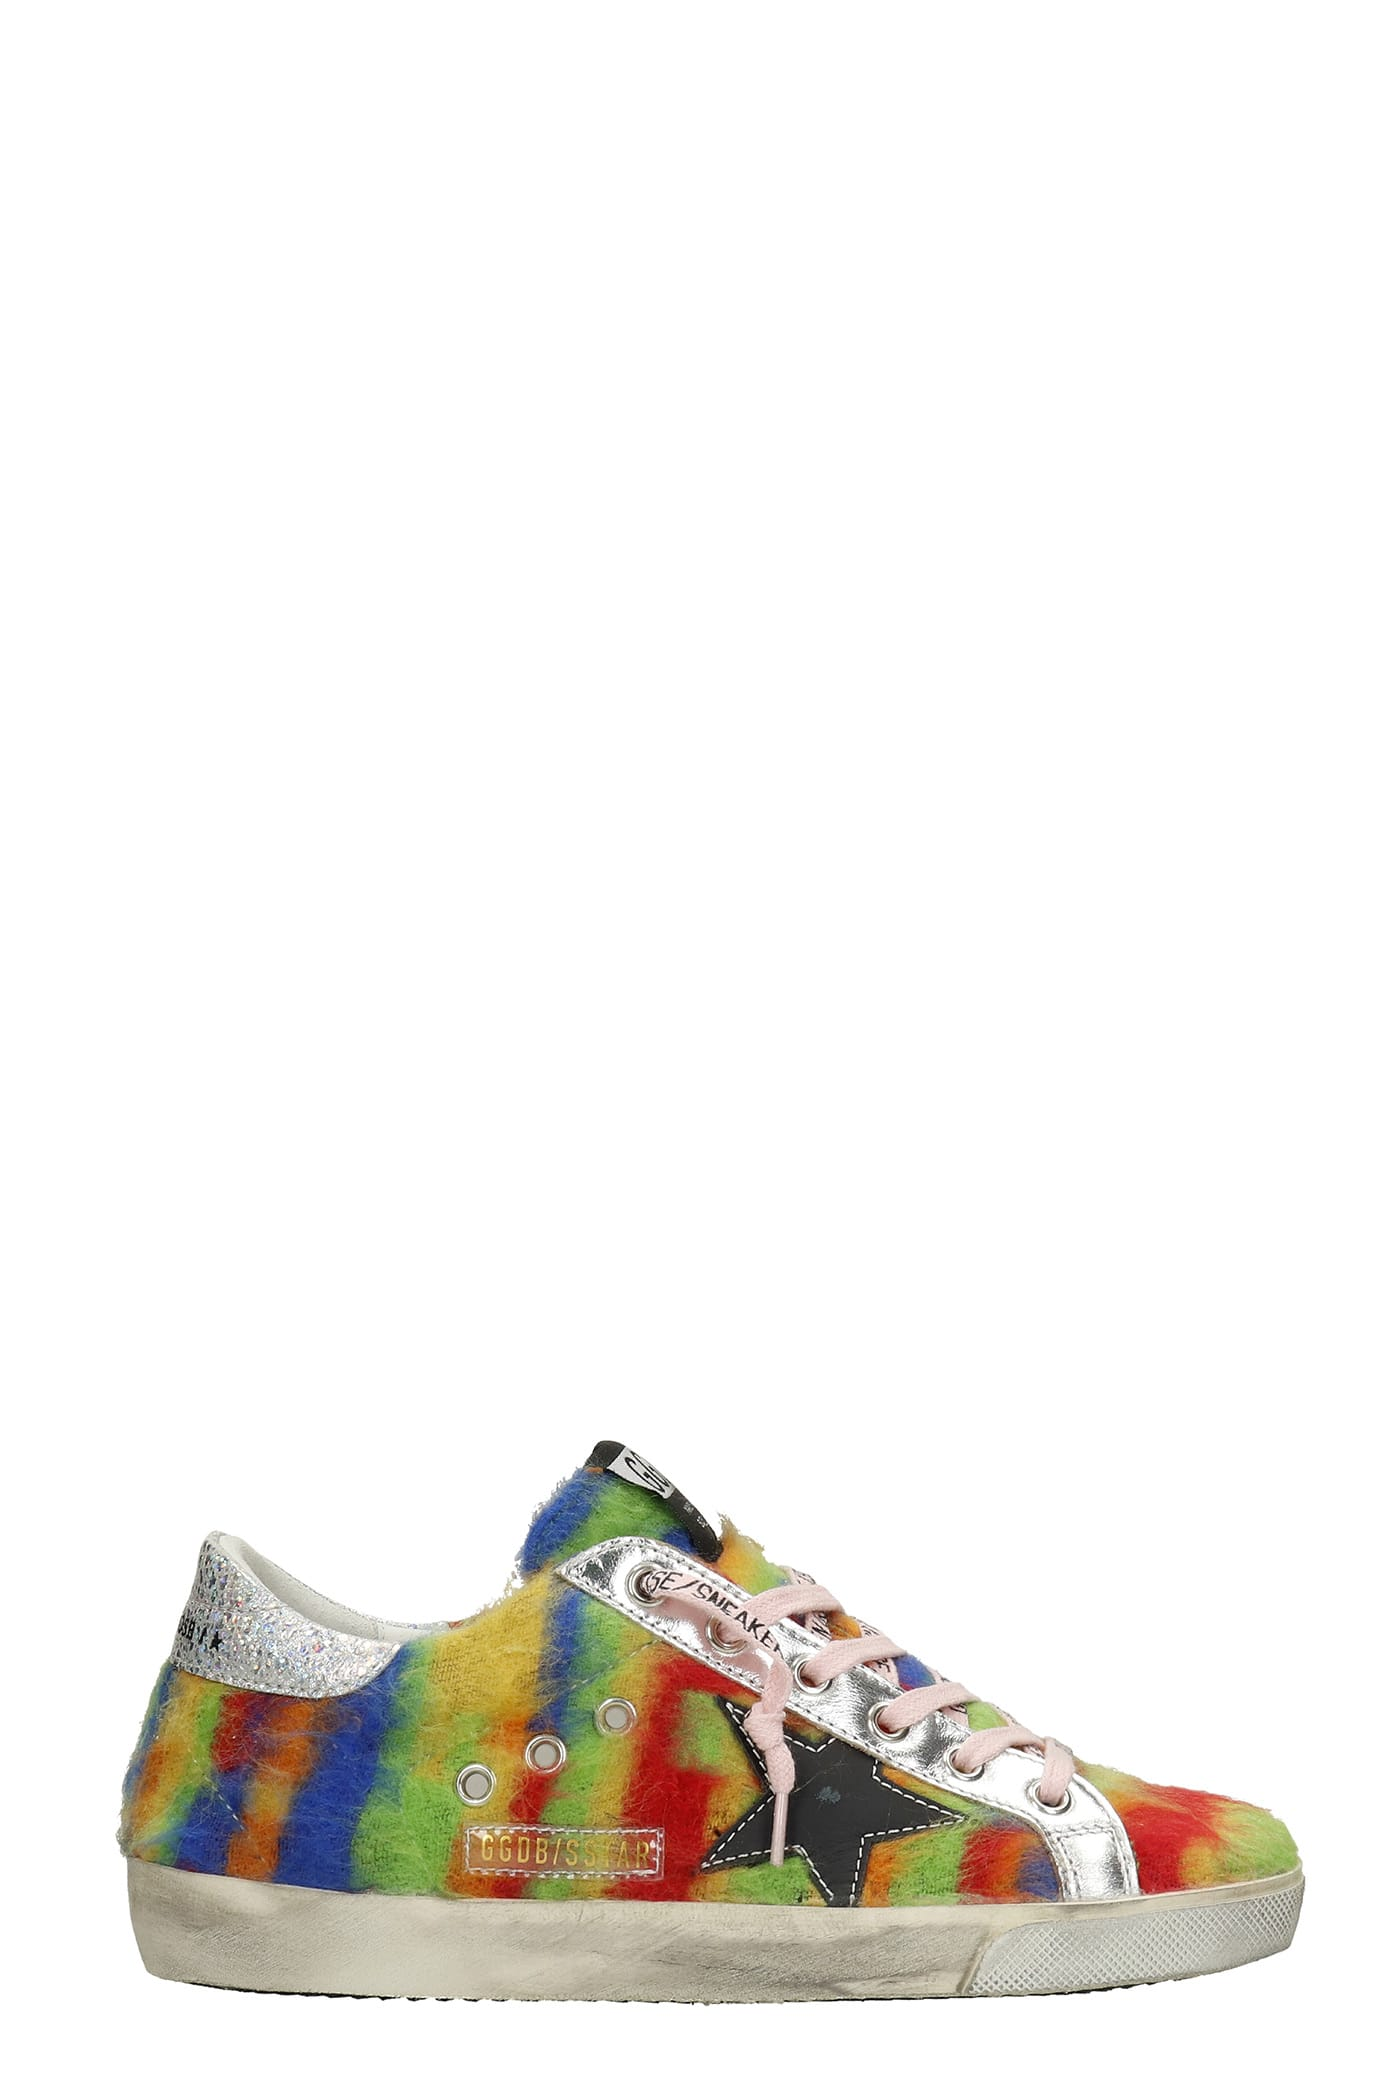 Golden Goose Superstar Sneakers In Multicolor Synthetic Fibers